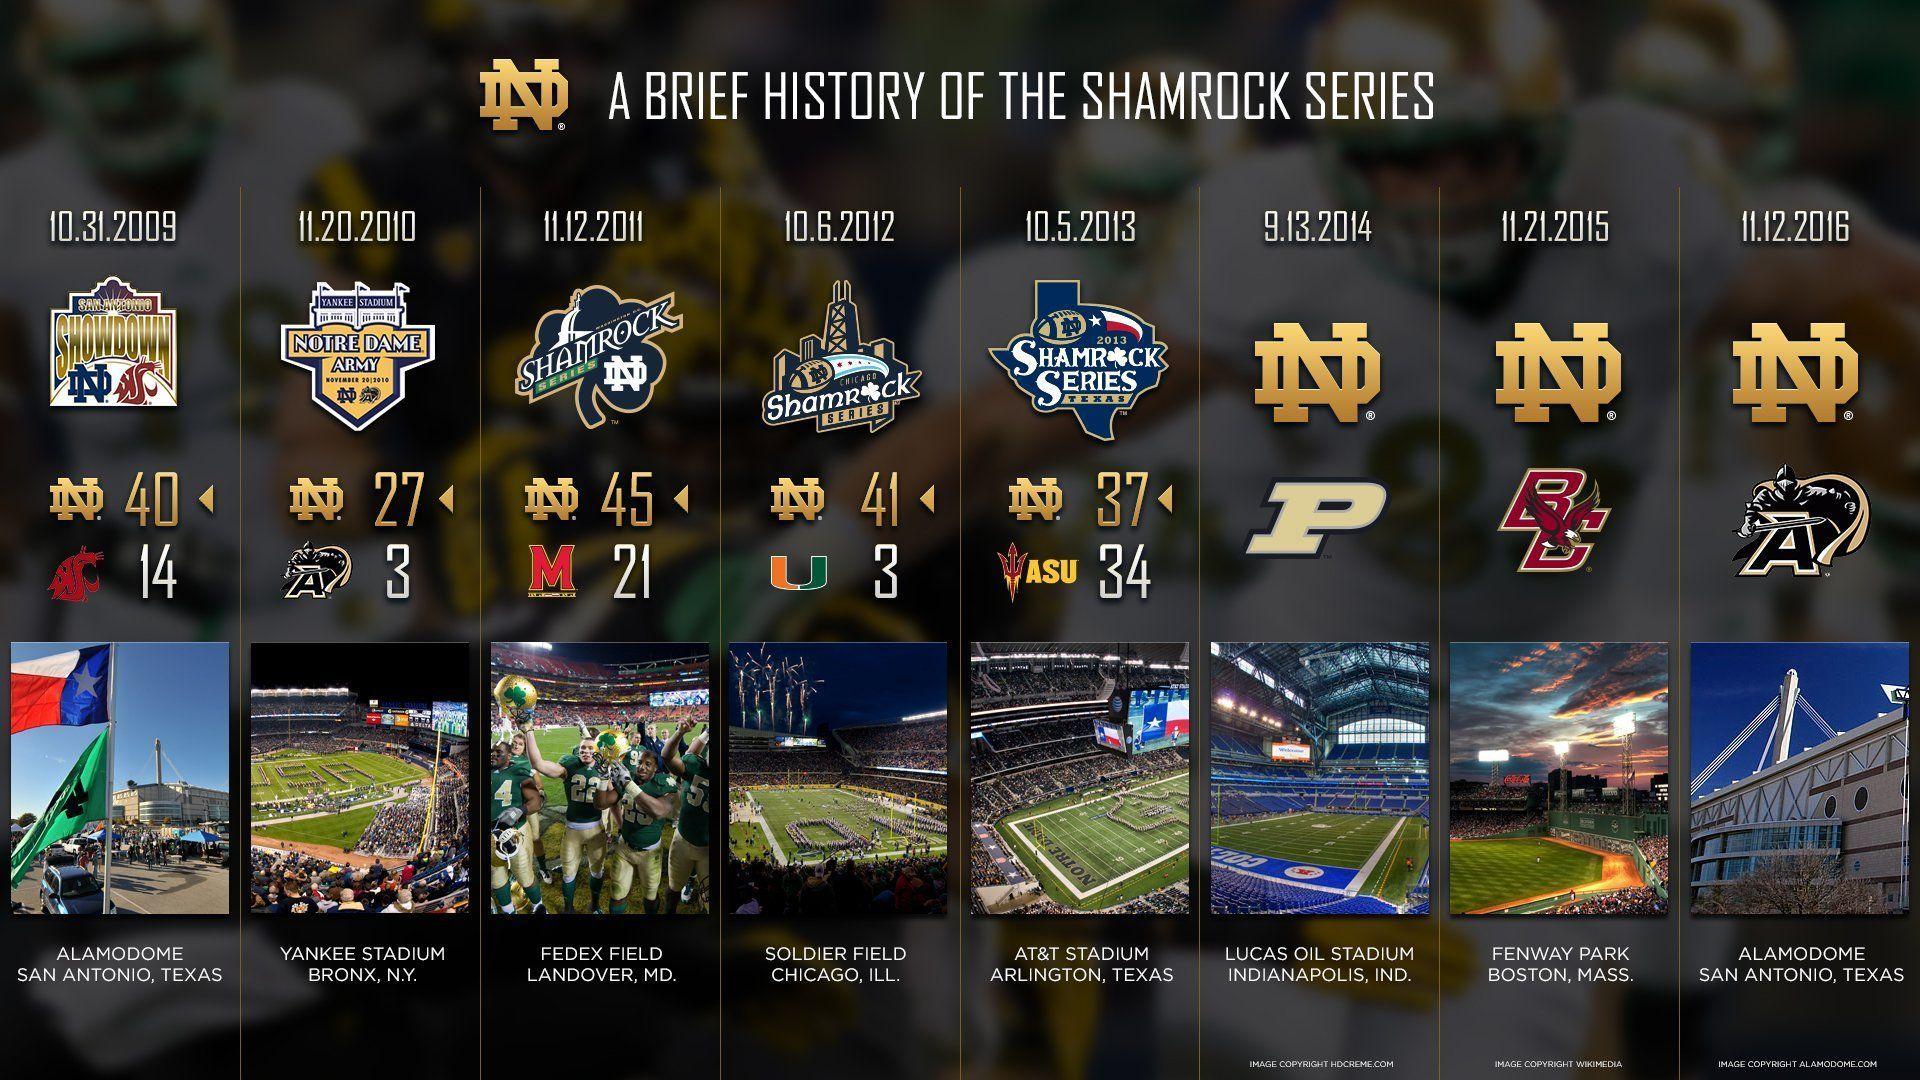 Free Download Best Notre Dame Basketball Images